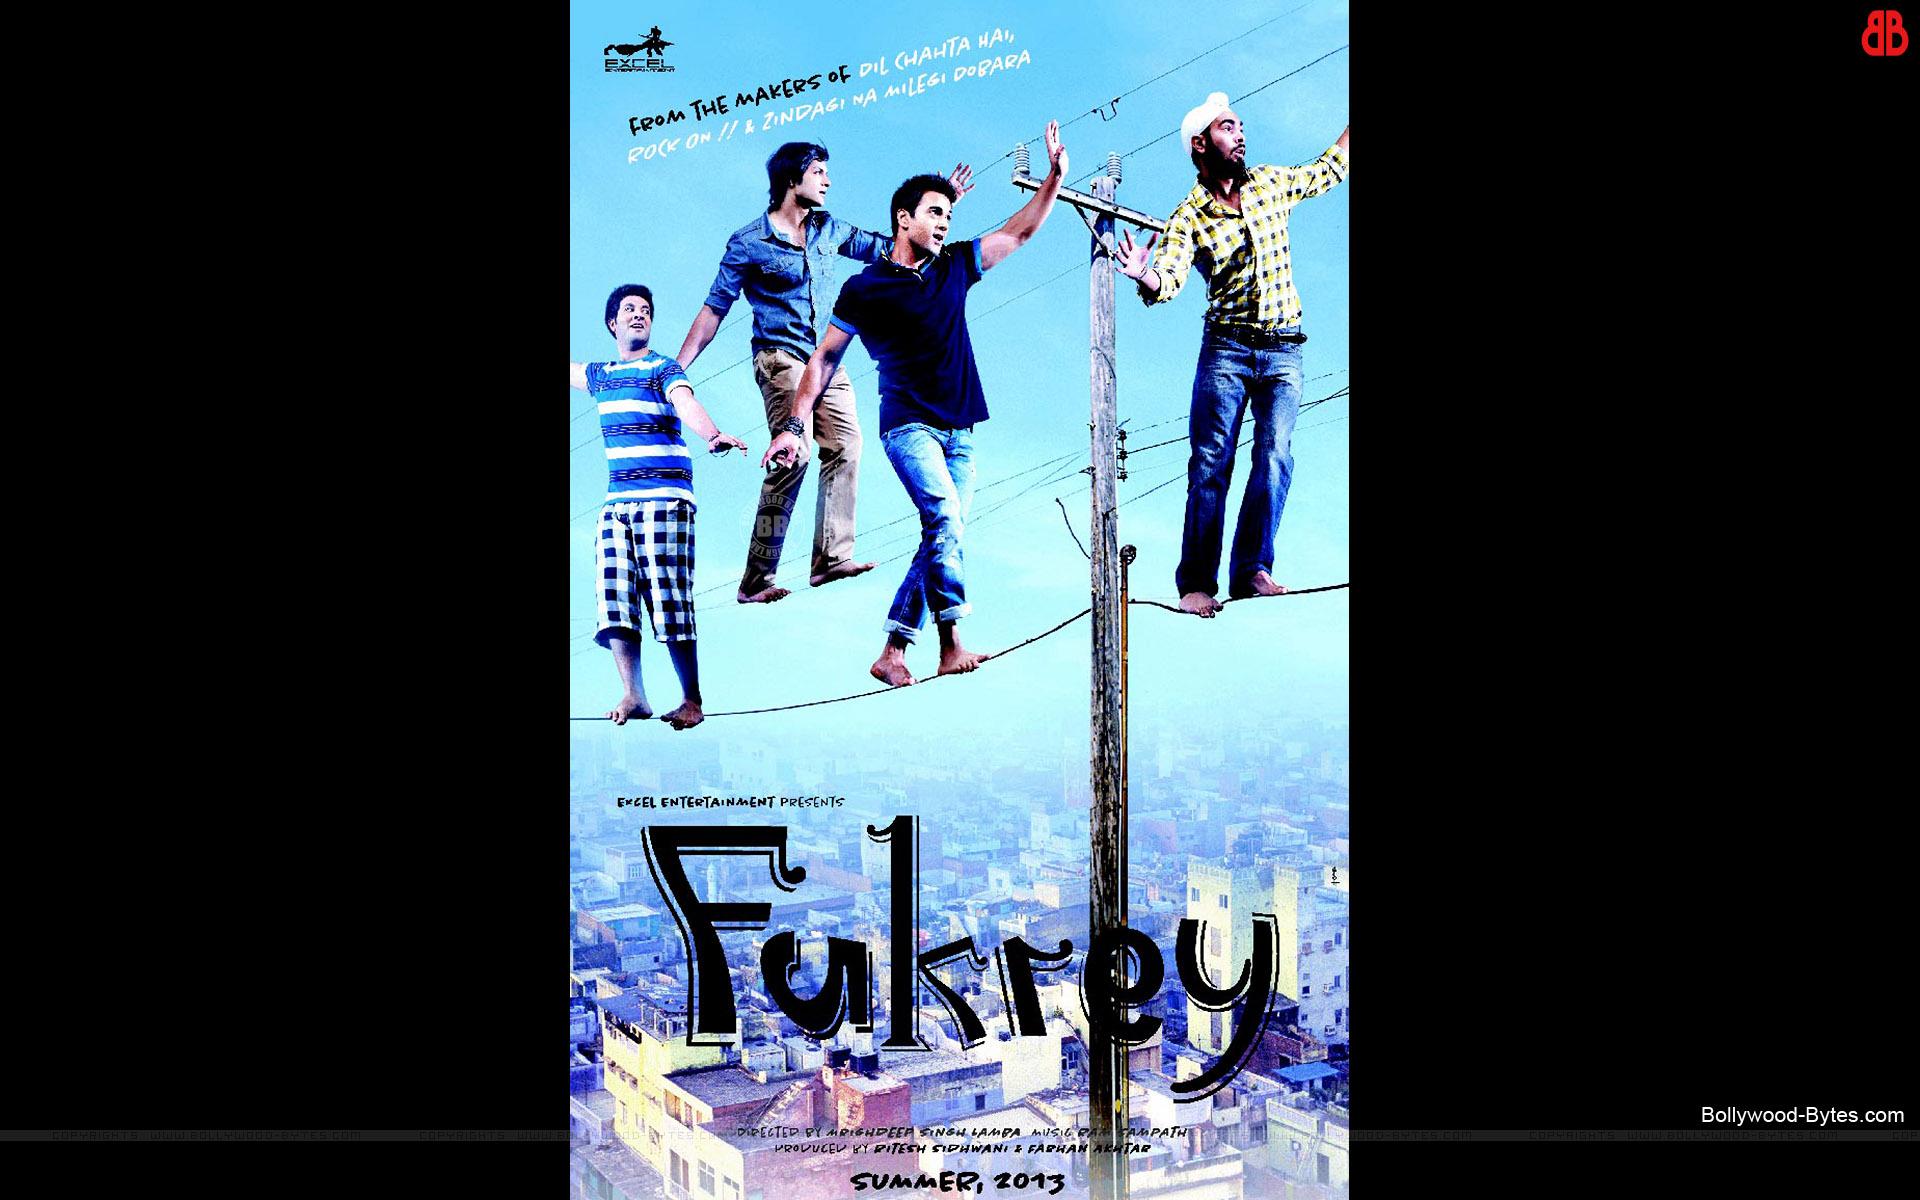 http://2.bp.blogspot.com/-A_y83epIxgI/UVaCNSuW_QI/AAAAAAAAc50/gEGGfZW2UH4/s1920/Fukrey-Pulkit-Samrat-Manjot-Singh-Ali-Fazal-Pankaj-Tripathi-HD-Wallpaper-03.jpg